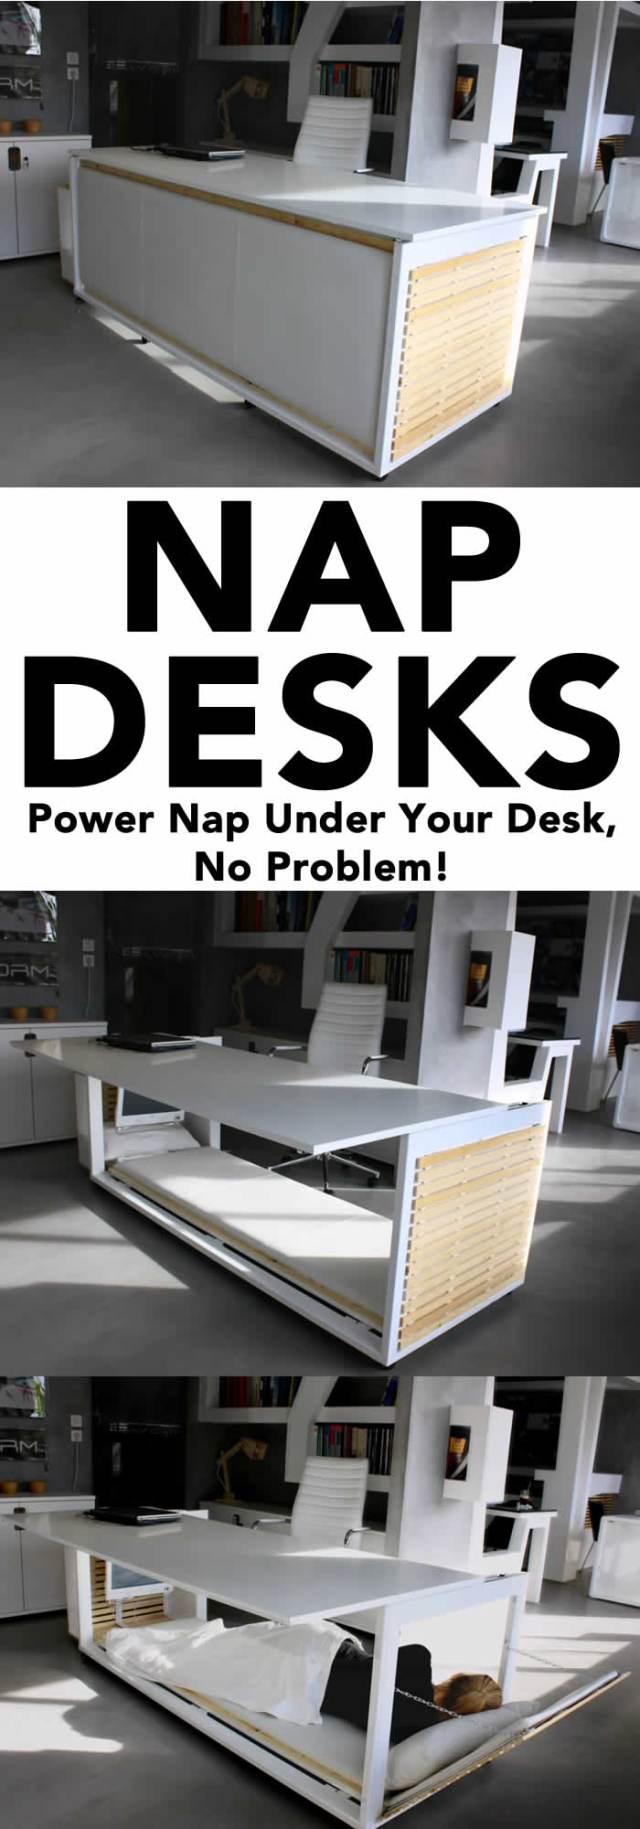 Nap Desks - a desk built for power napping